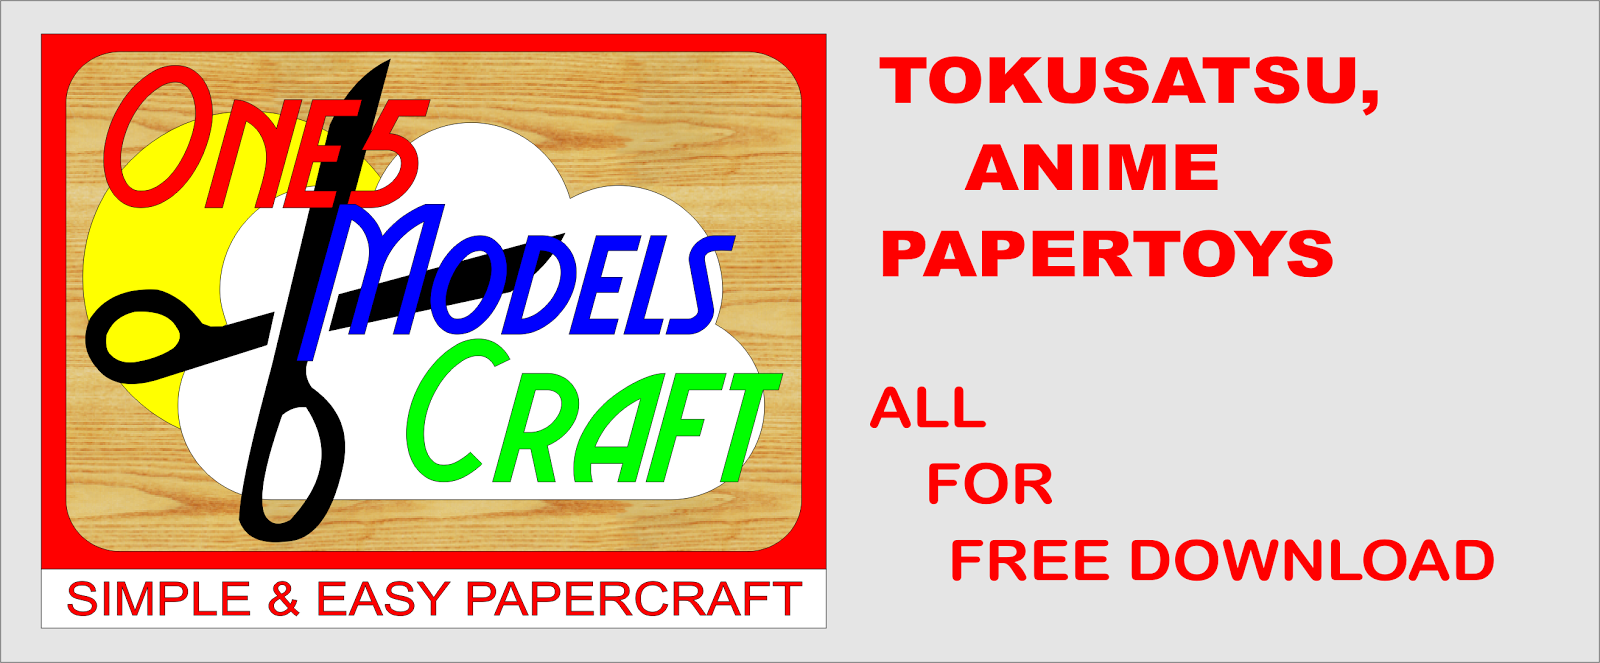 One5 Models Craft